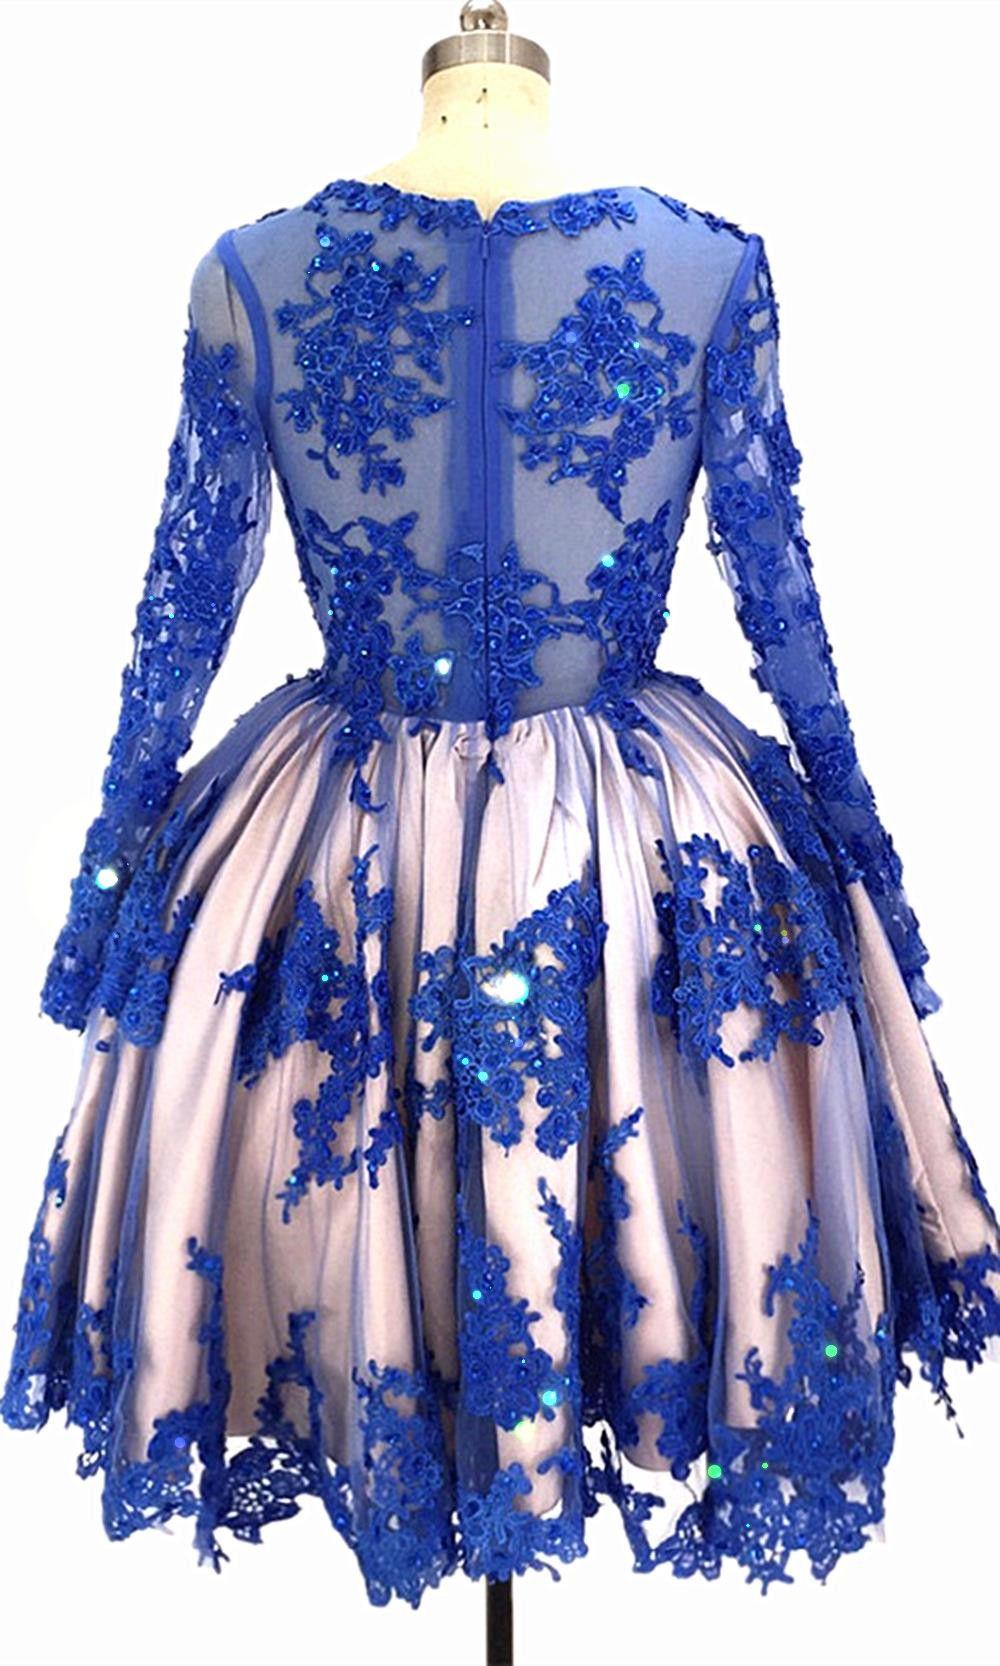 32+ Royal blue wedding dress with sleeves ideas